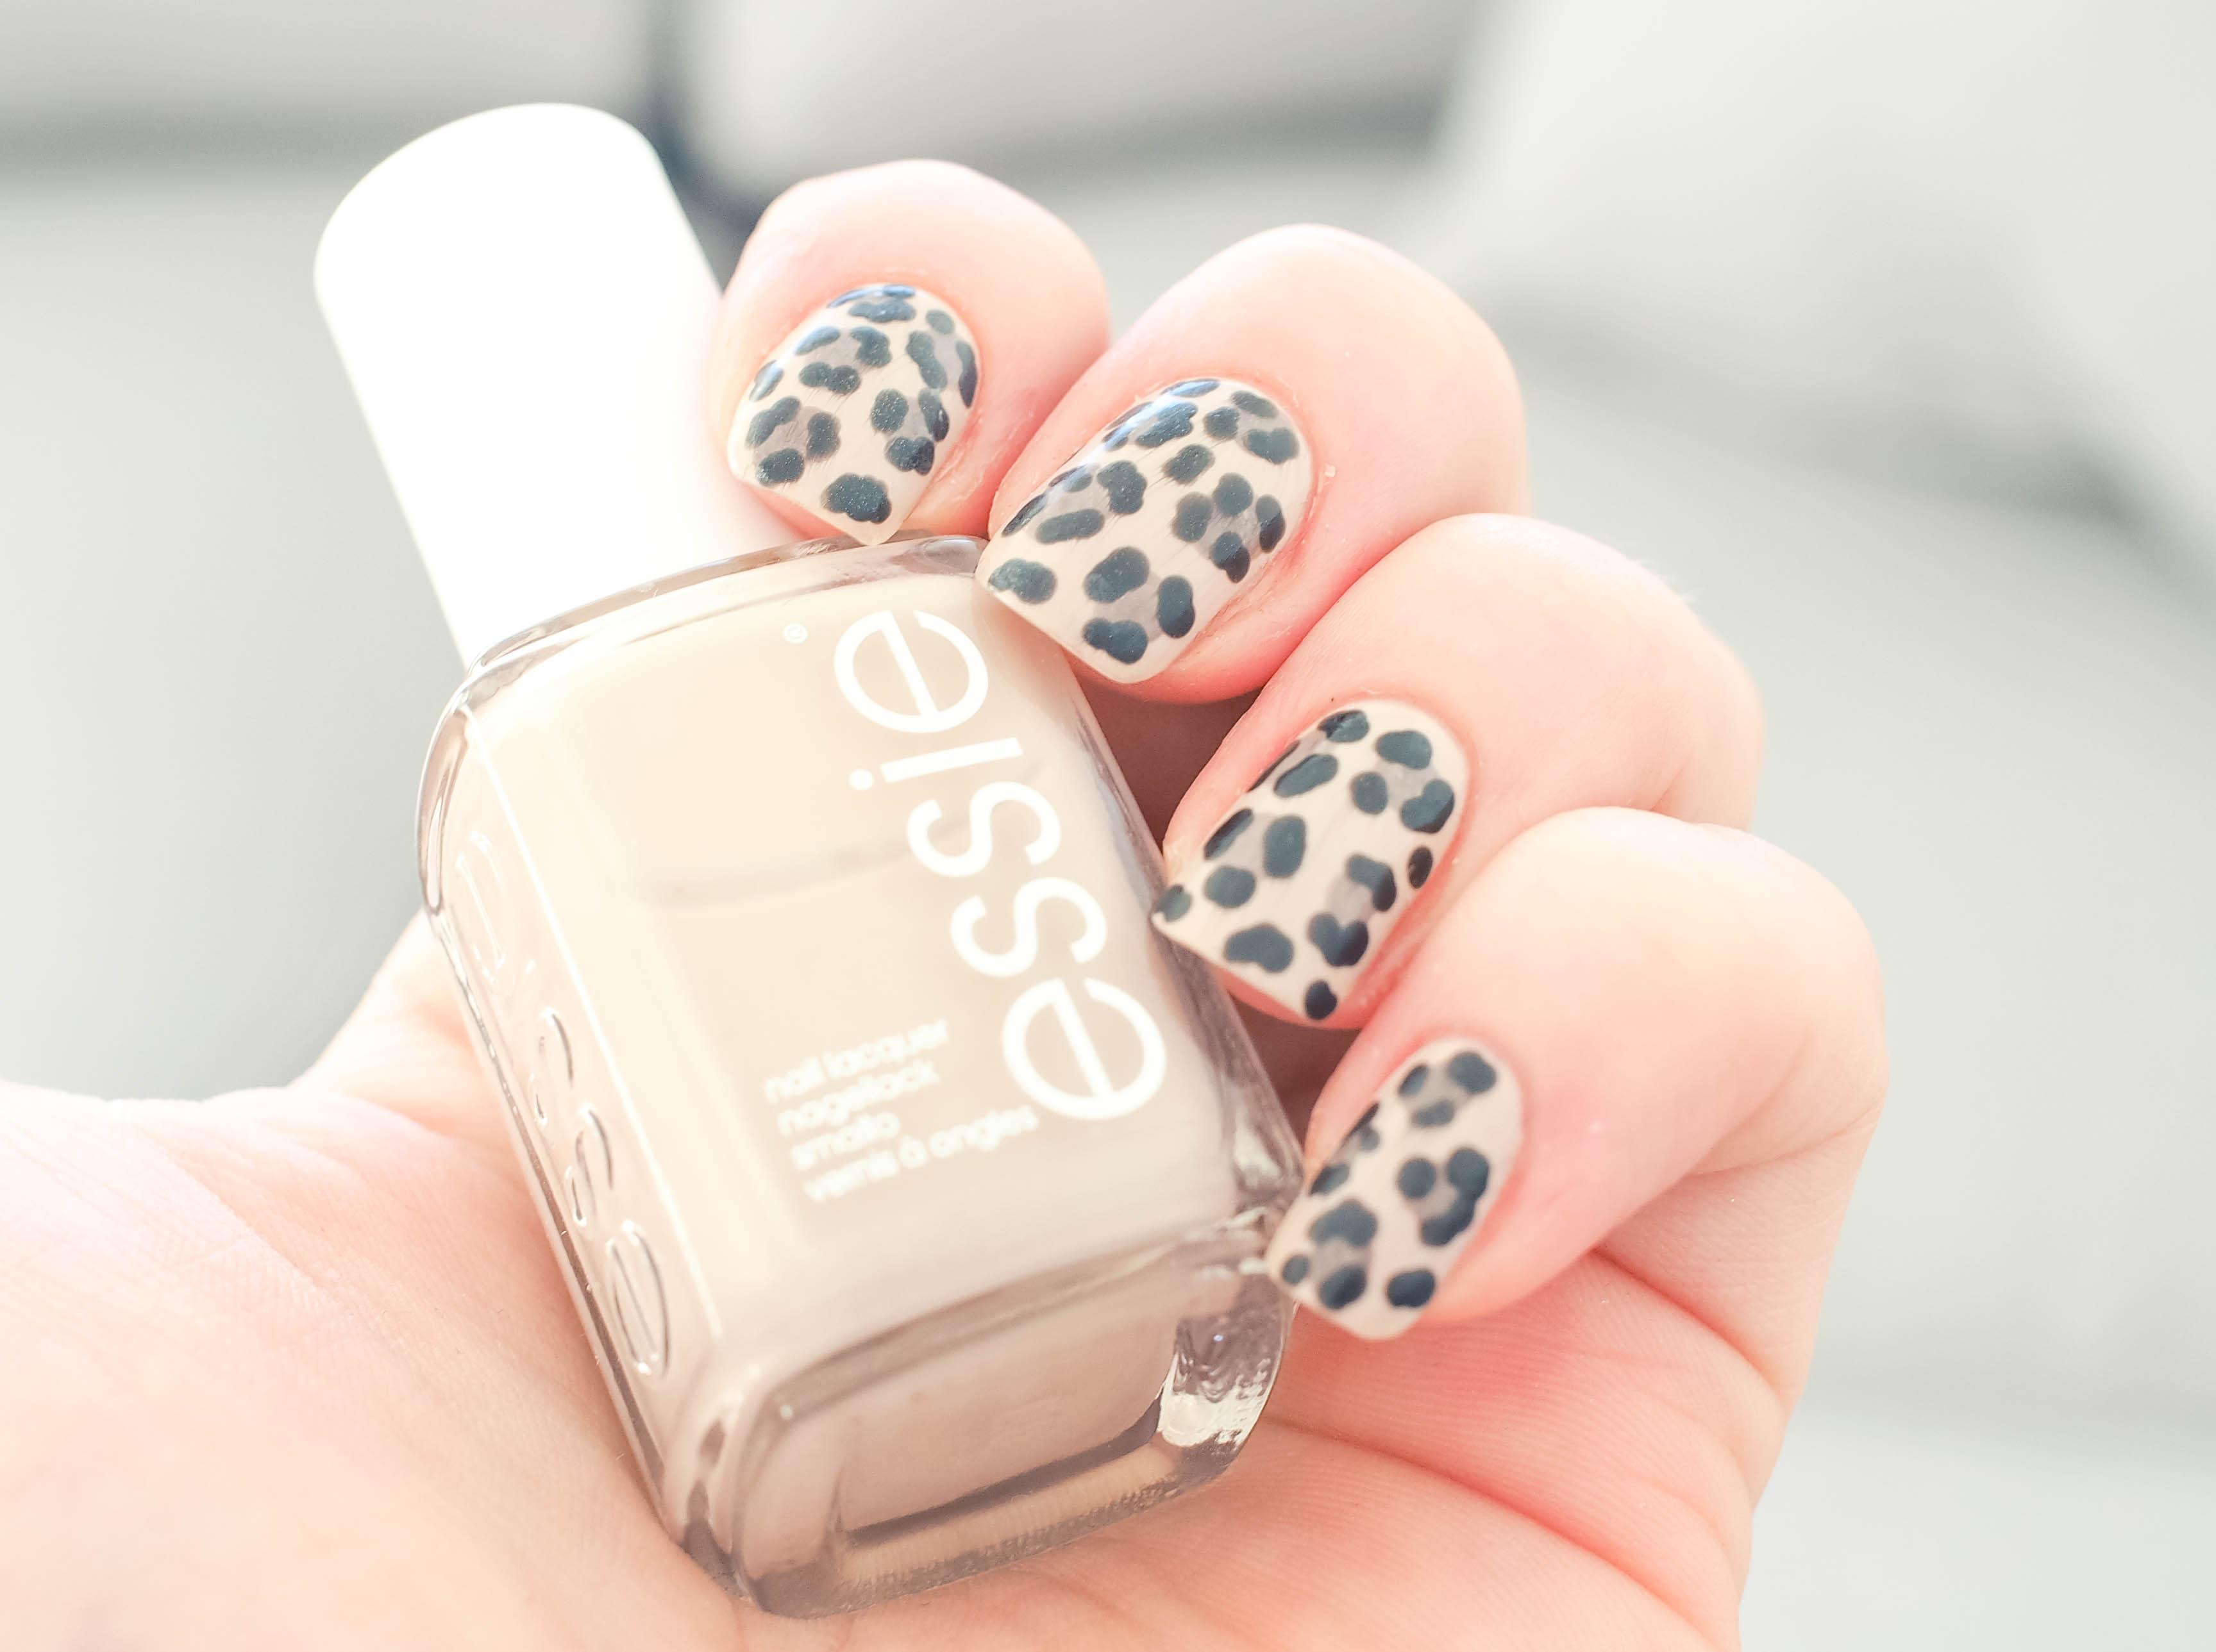 Tee itse - Helpot ja upeat leopardikynnet!